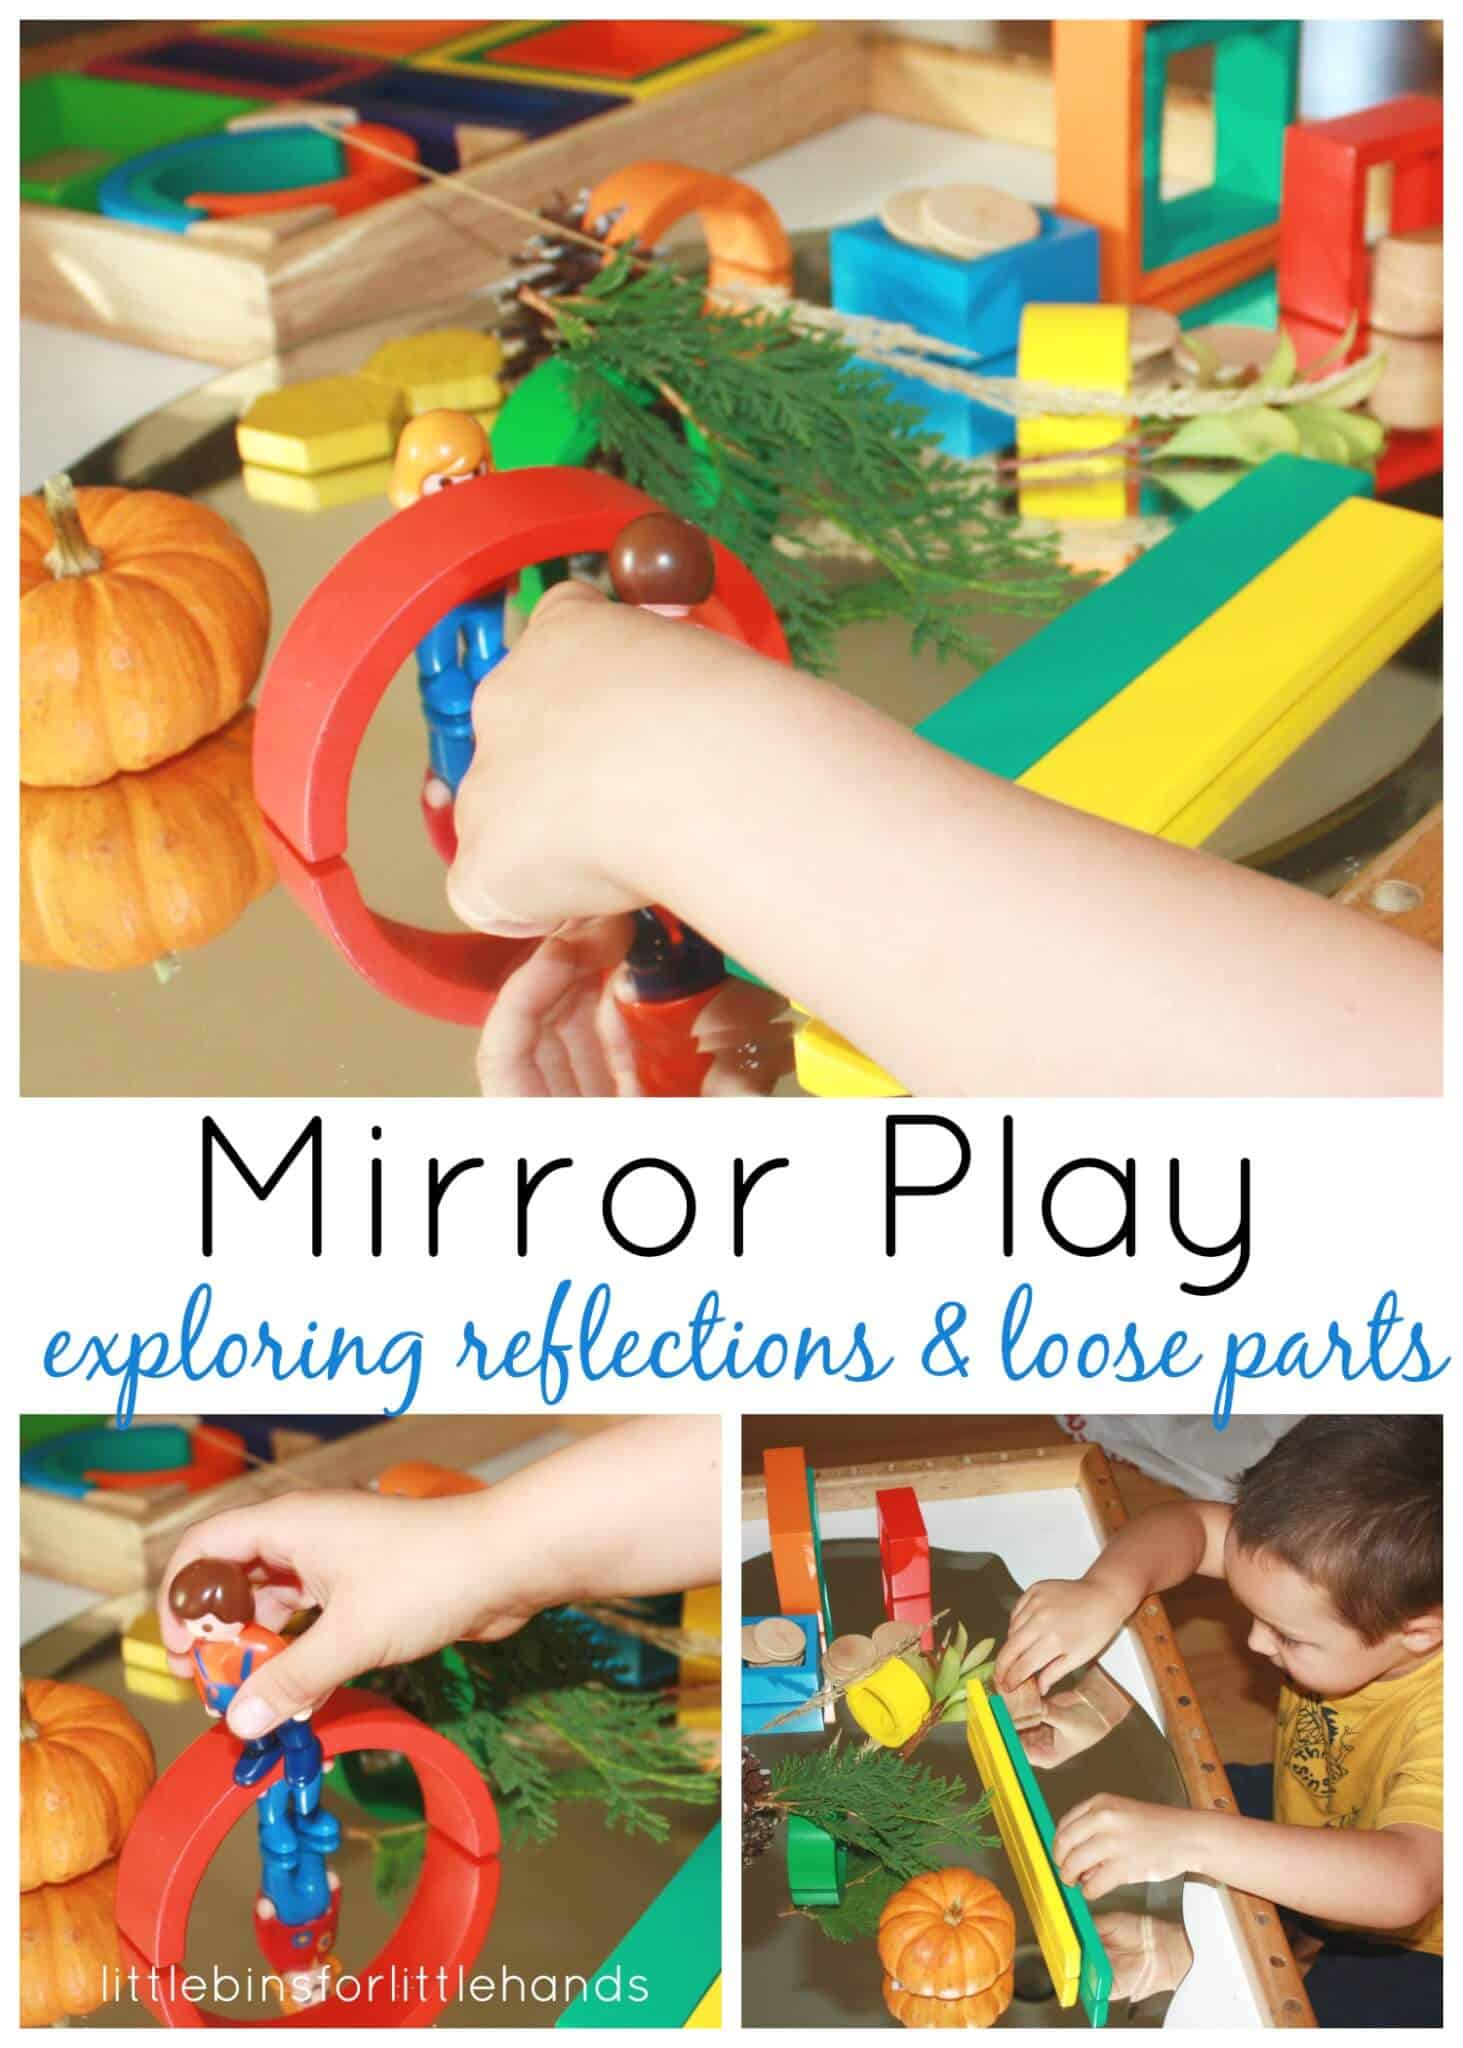 Preschool Discovery Table Mirror Play